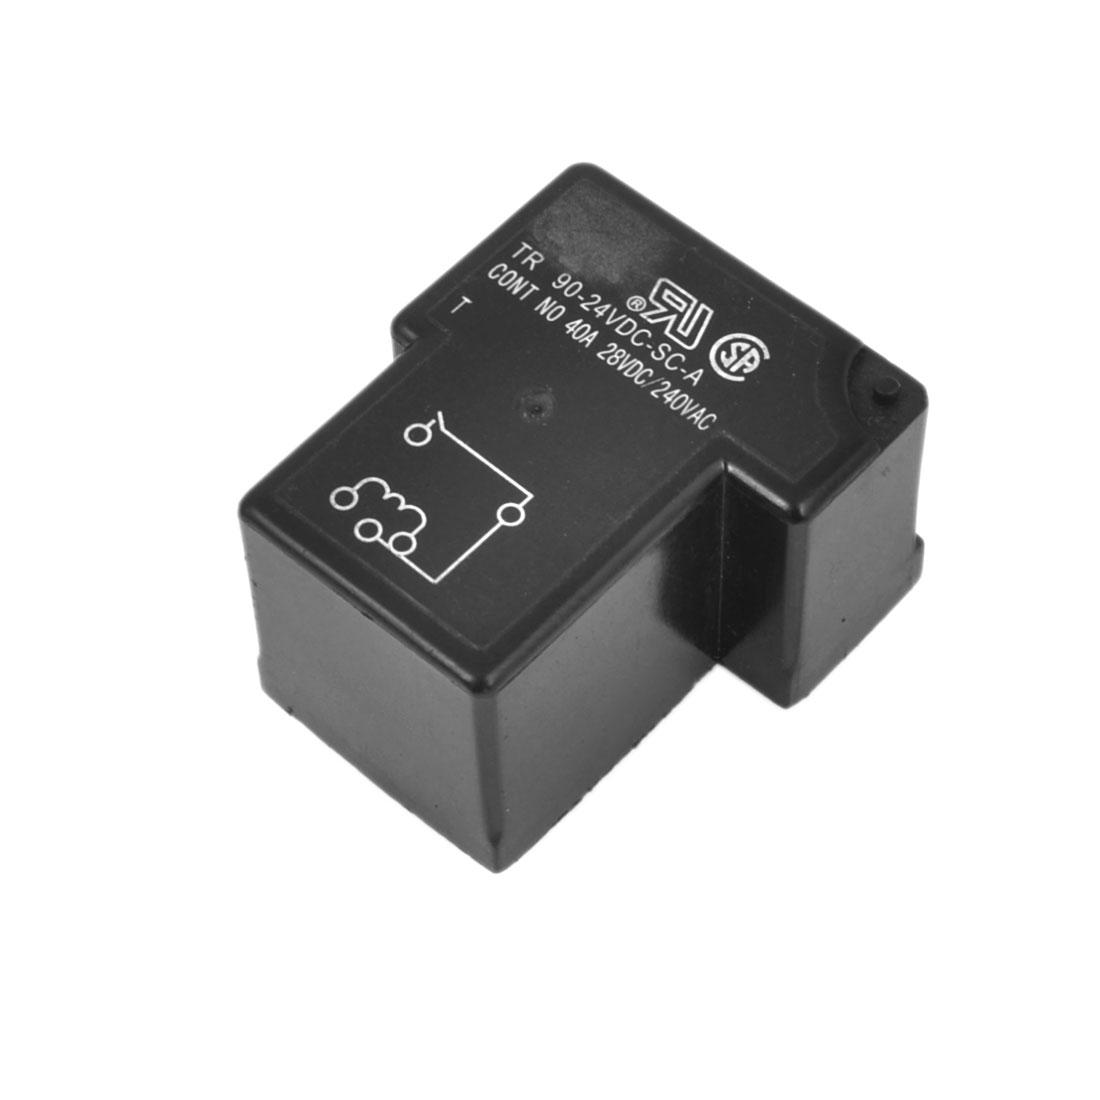 Input DC 24V Output AC240V DC28V 40A SSR PCB Solid State Relay Black